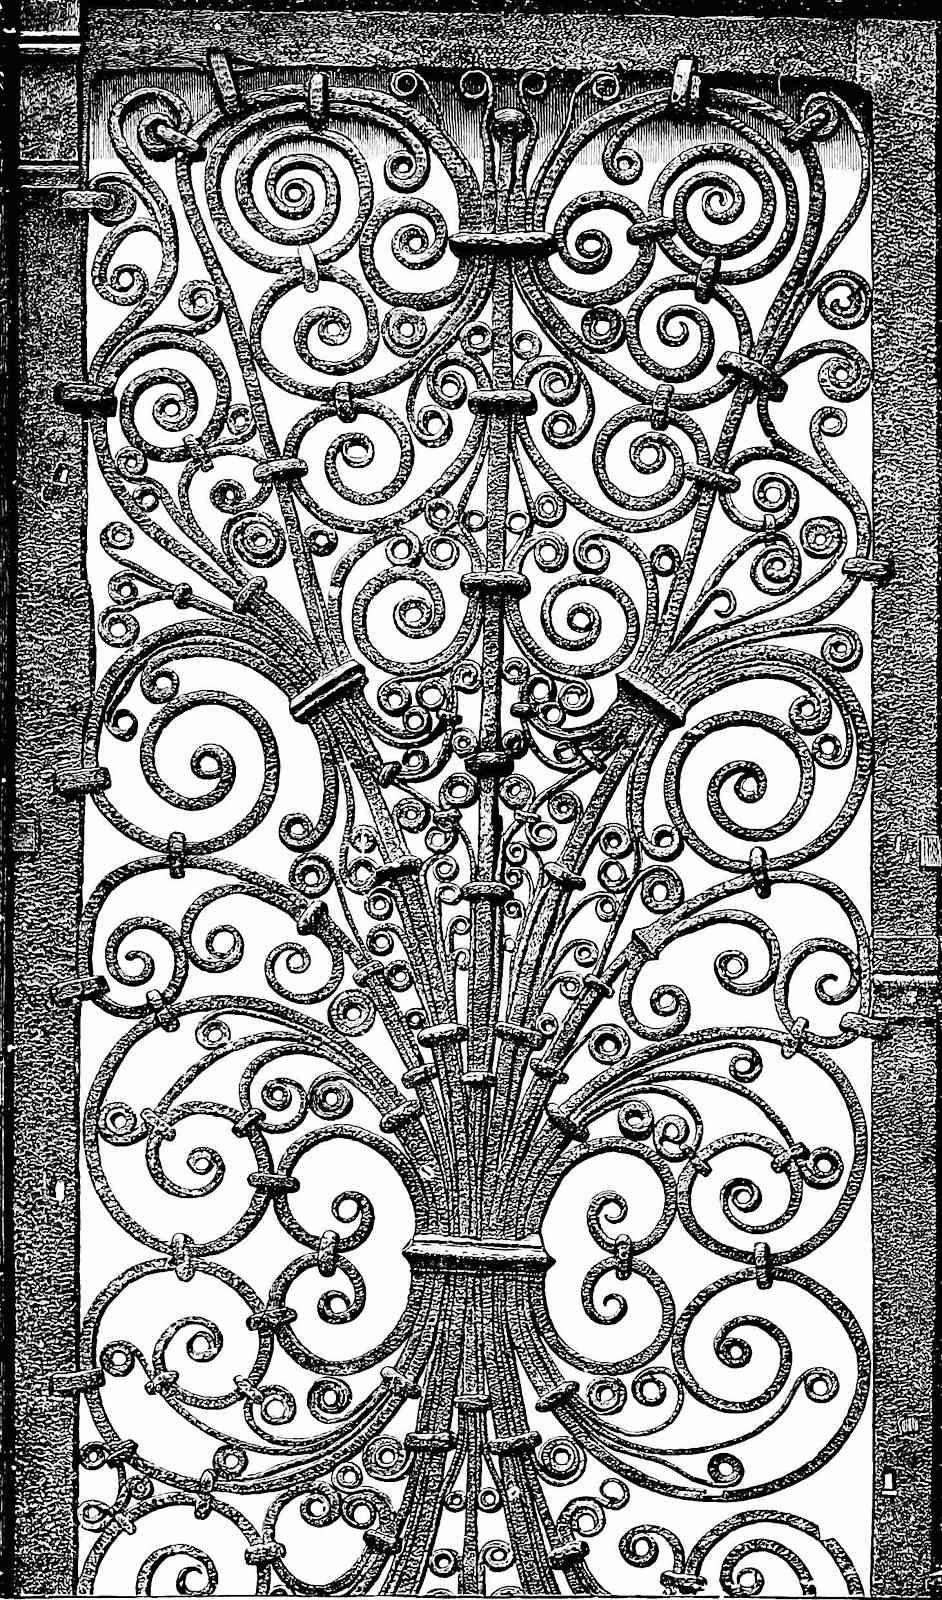 a year 1201 metal gate illustration